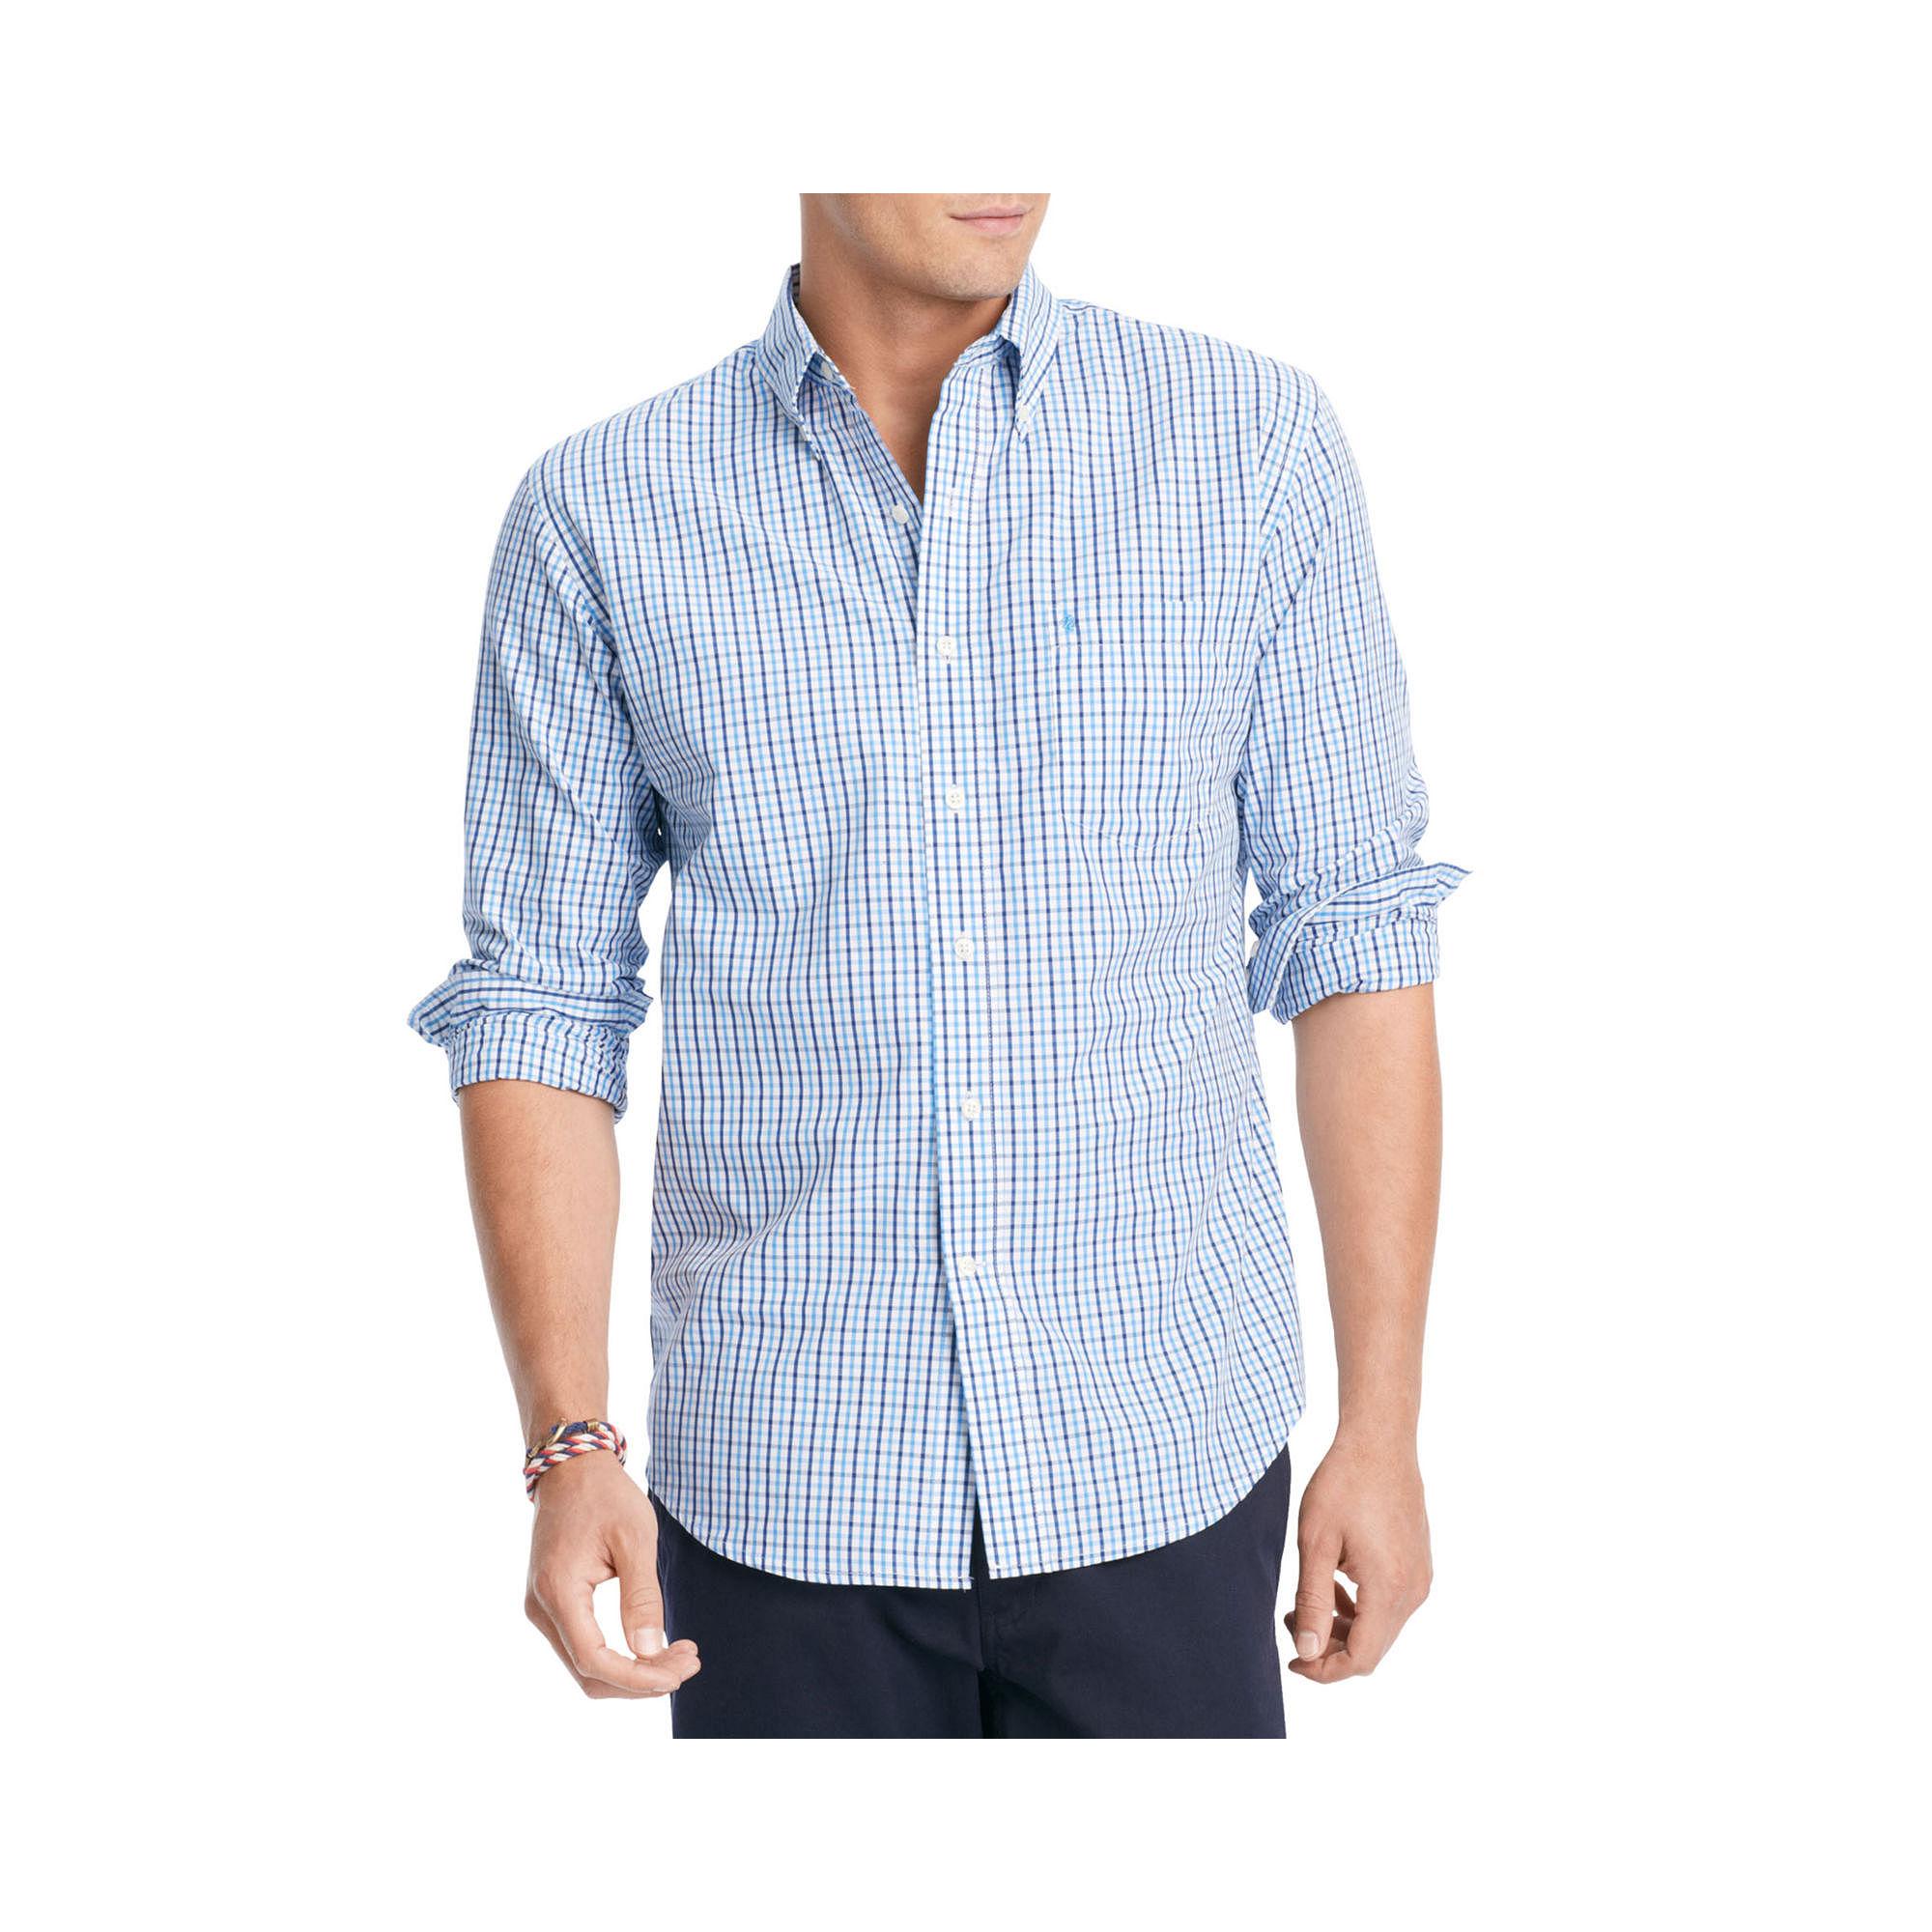 Upc 014056123842 Izod Mens Long Sleeve Essential Tattersall